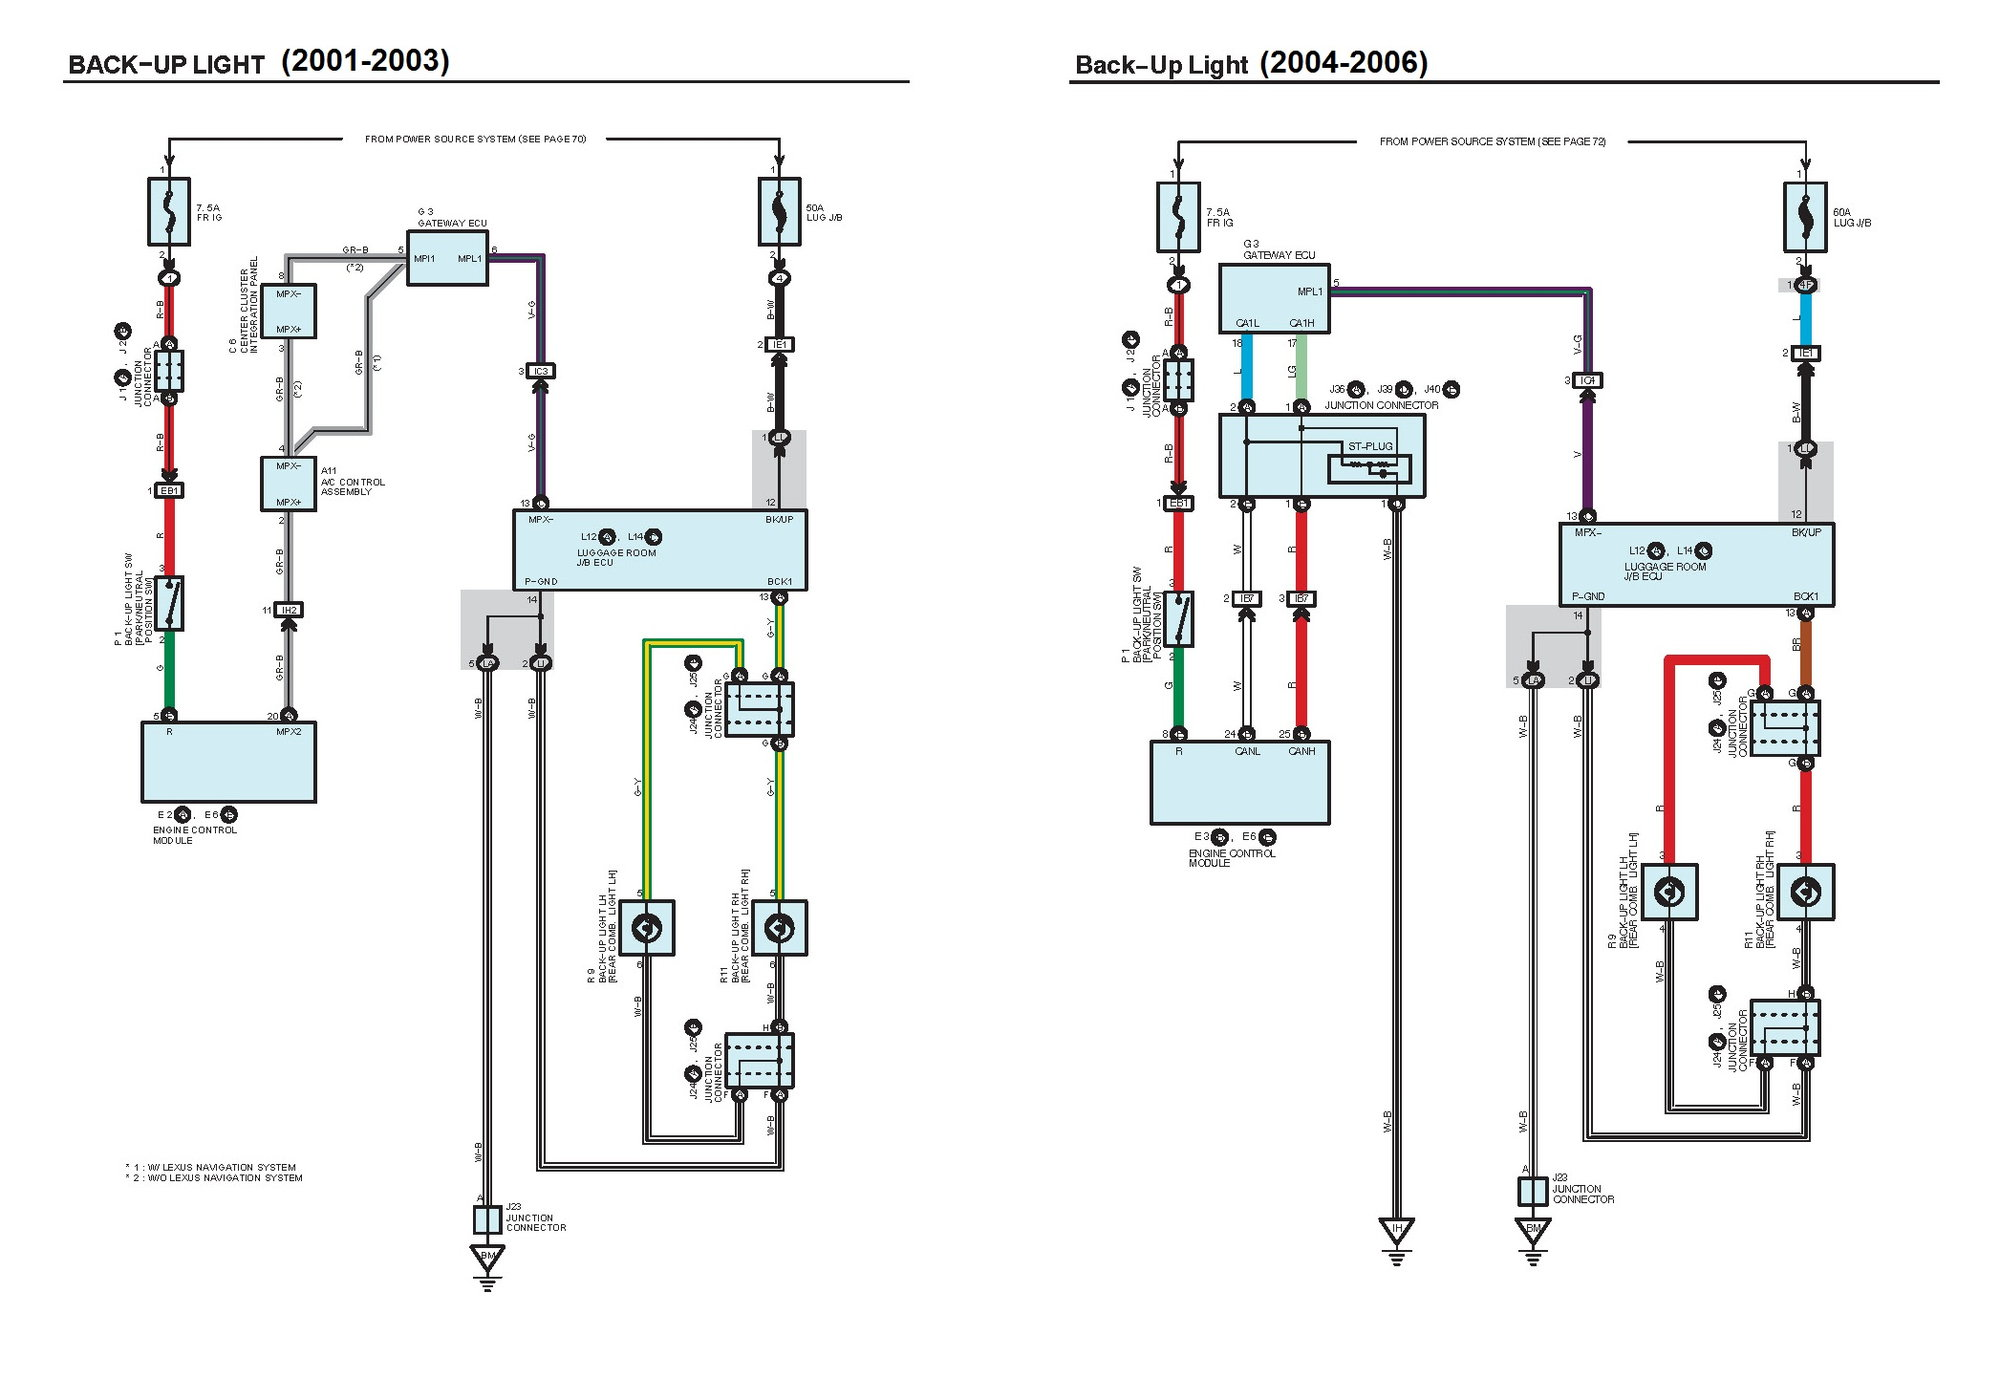 Wiring Diagram Backup Camera 2003 Lexus from cimg9.ibsrv.net